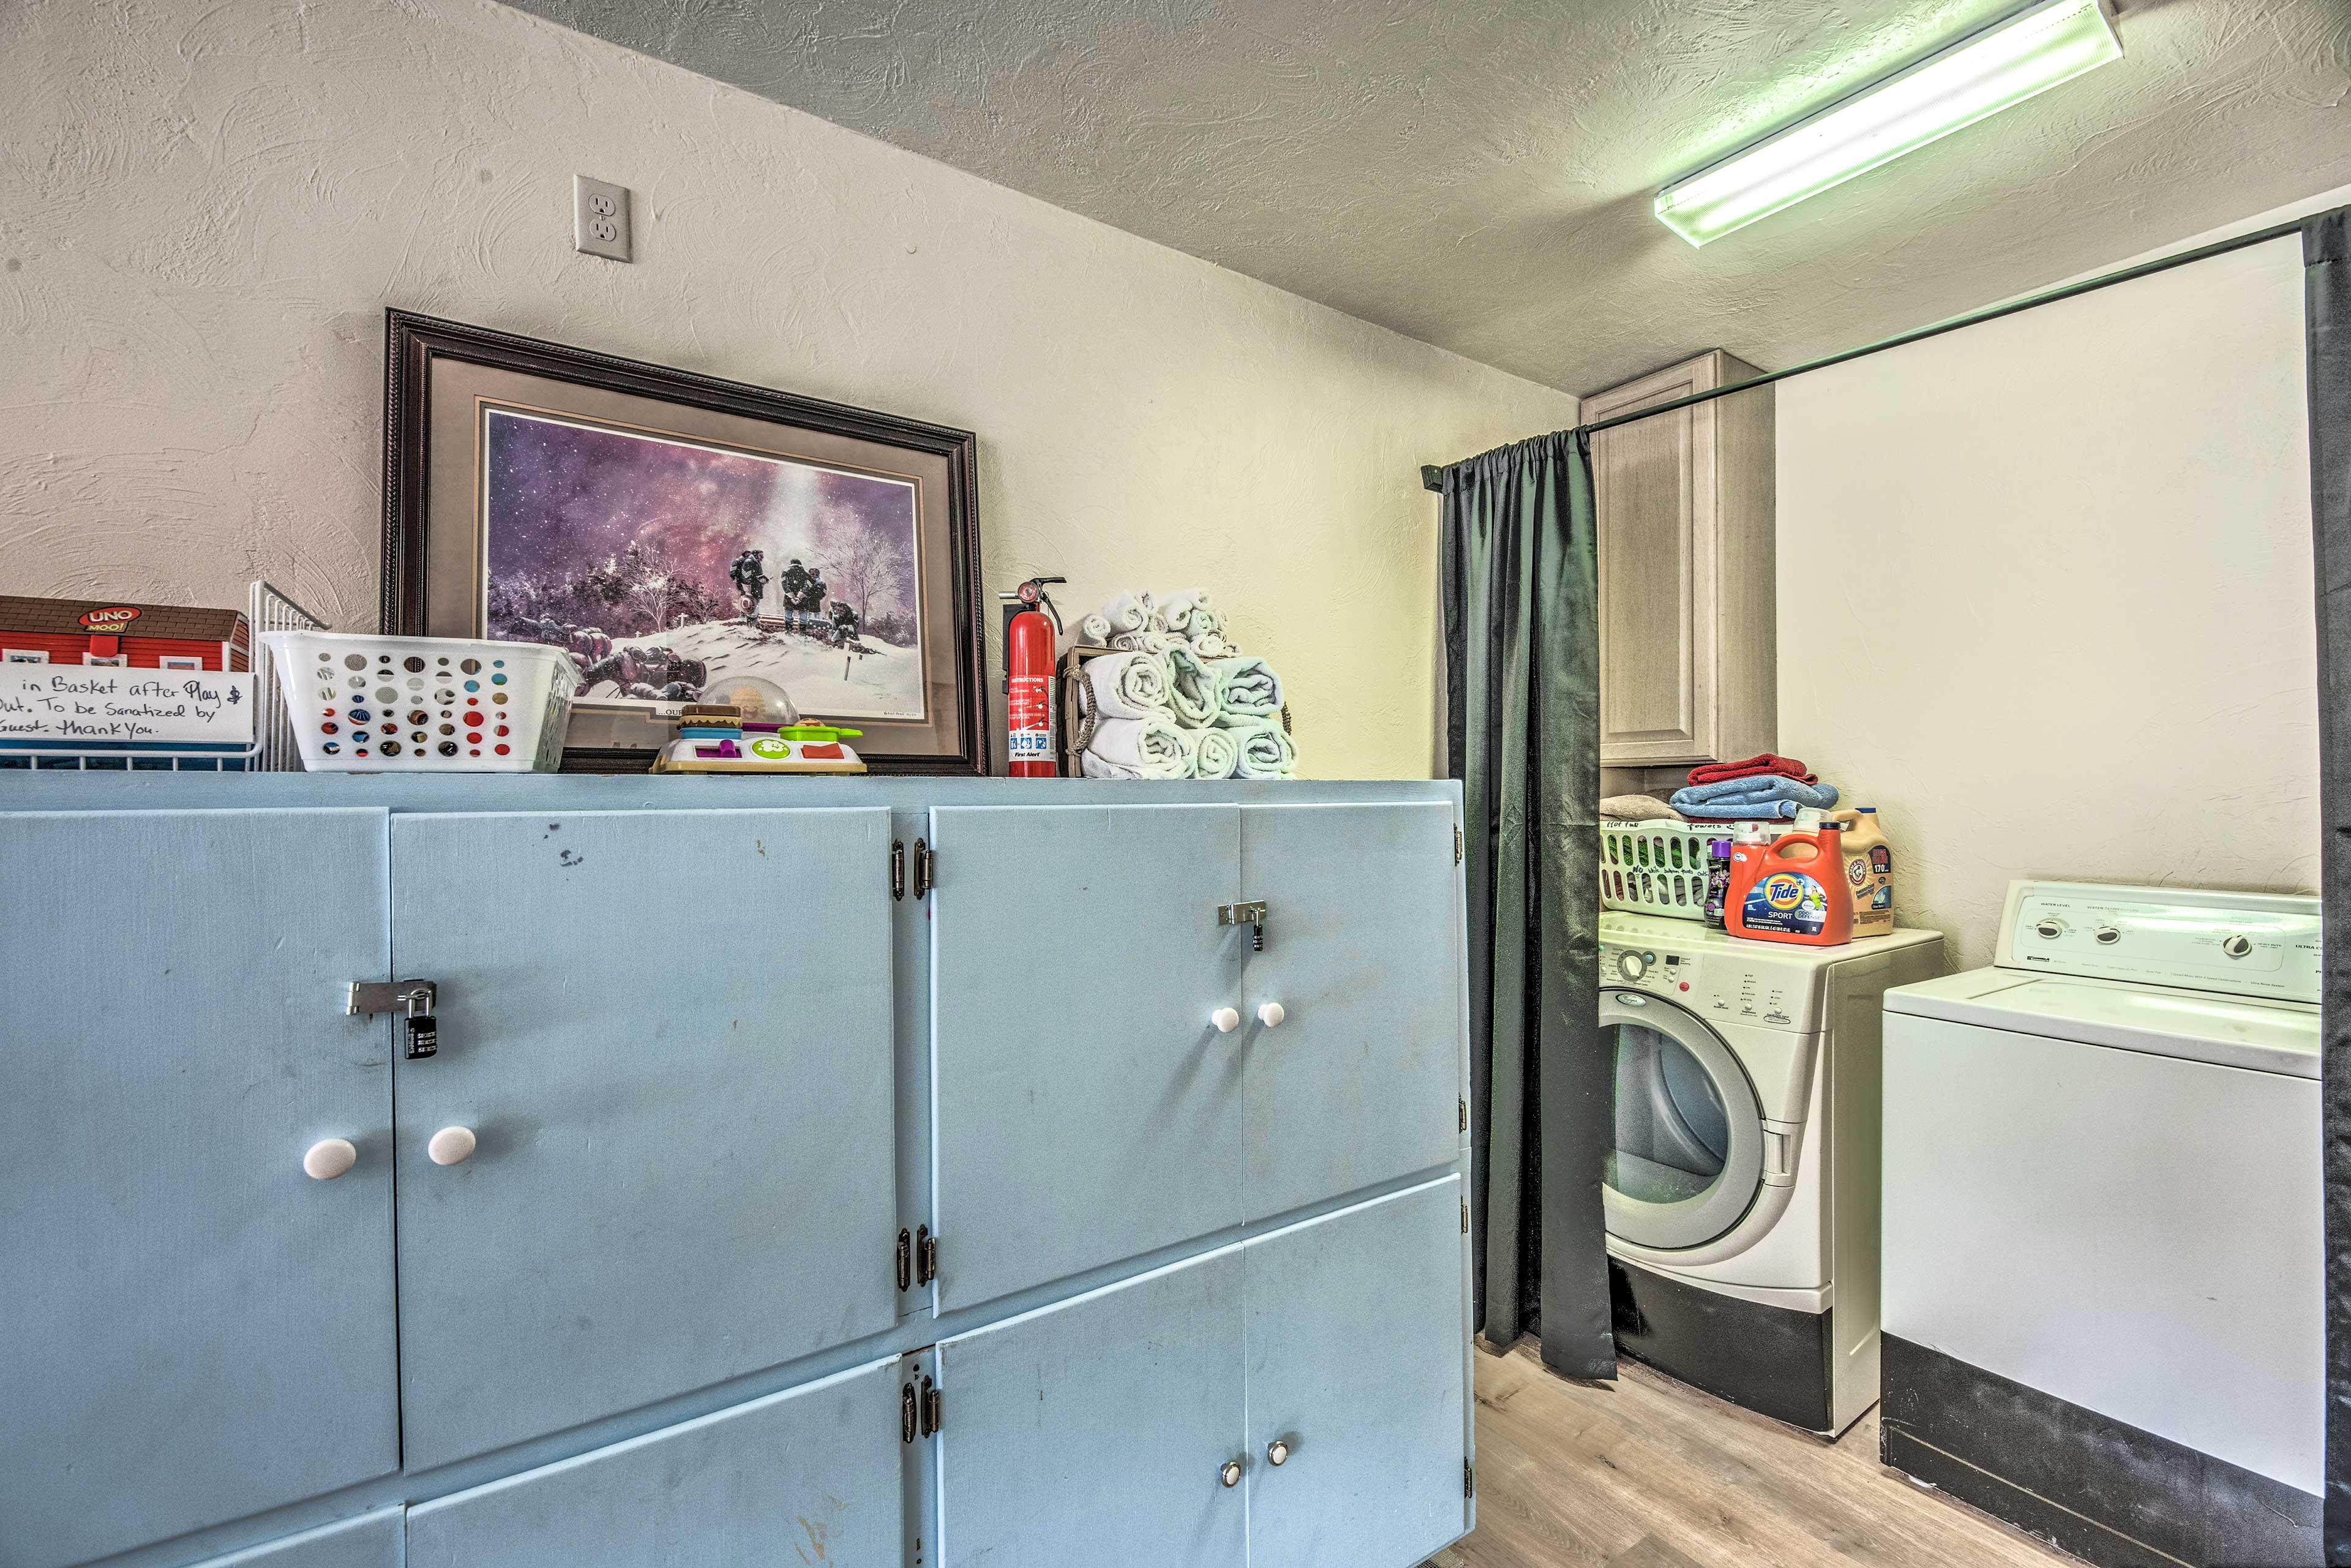 Game Room | Laundry Closet | Full-Sized Washer/Dryer